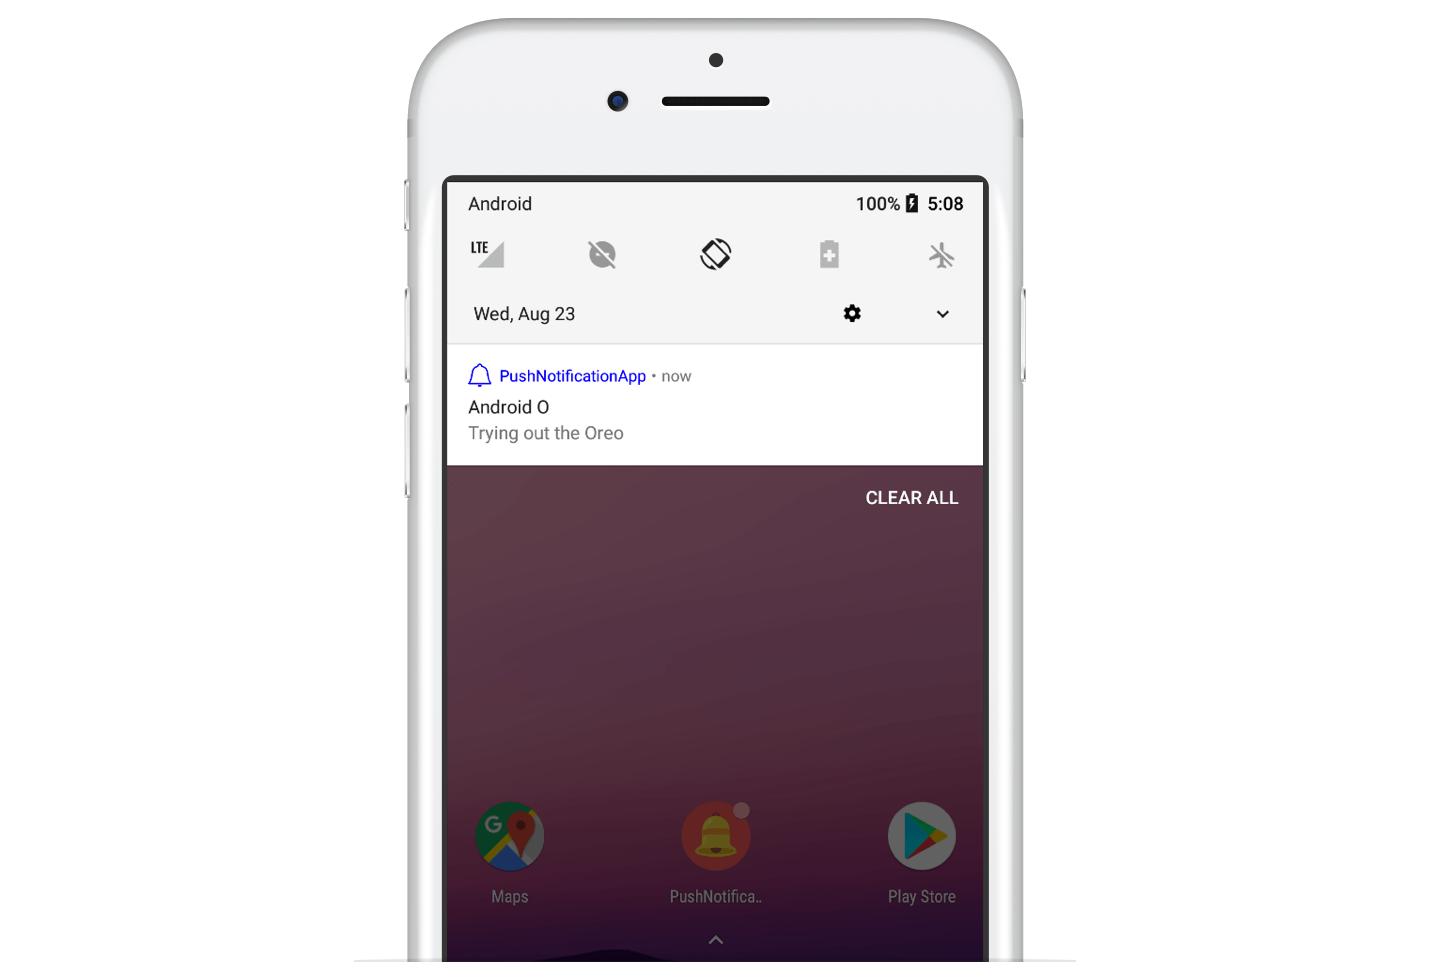 Android Oreo Push Notifications